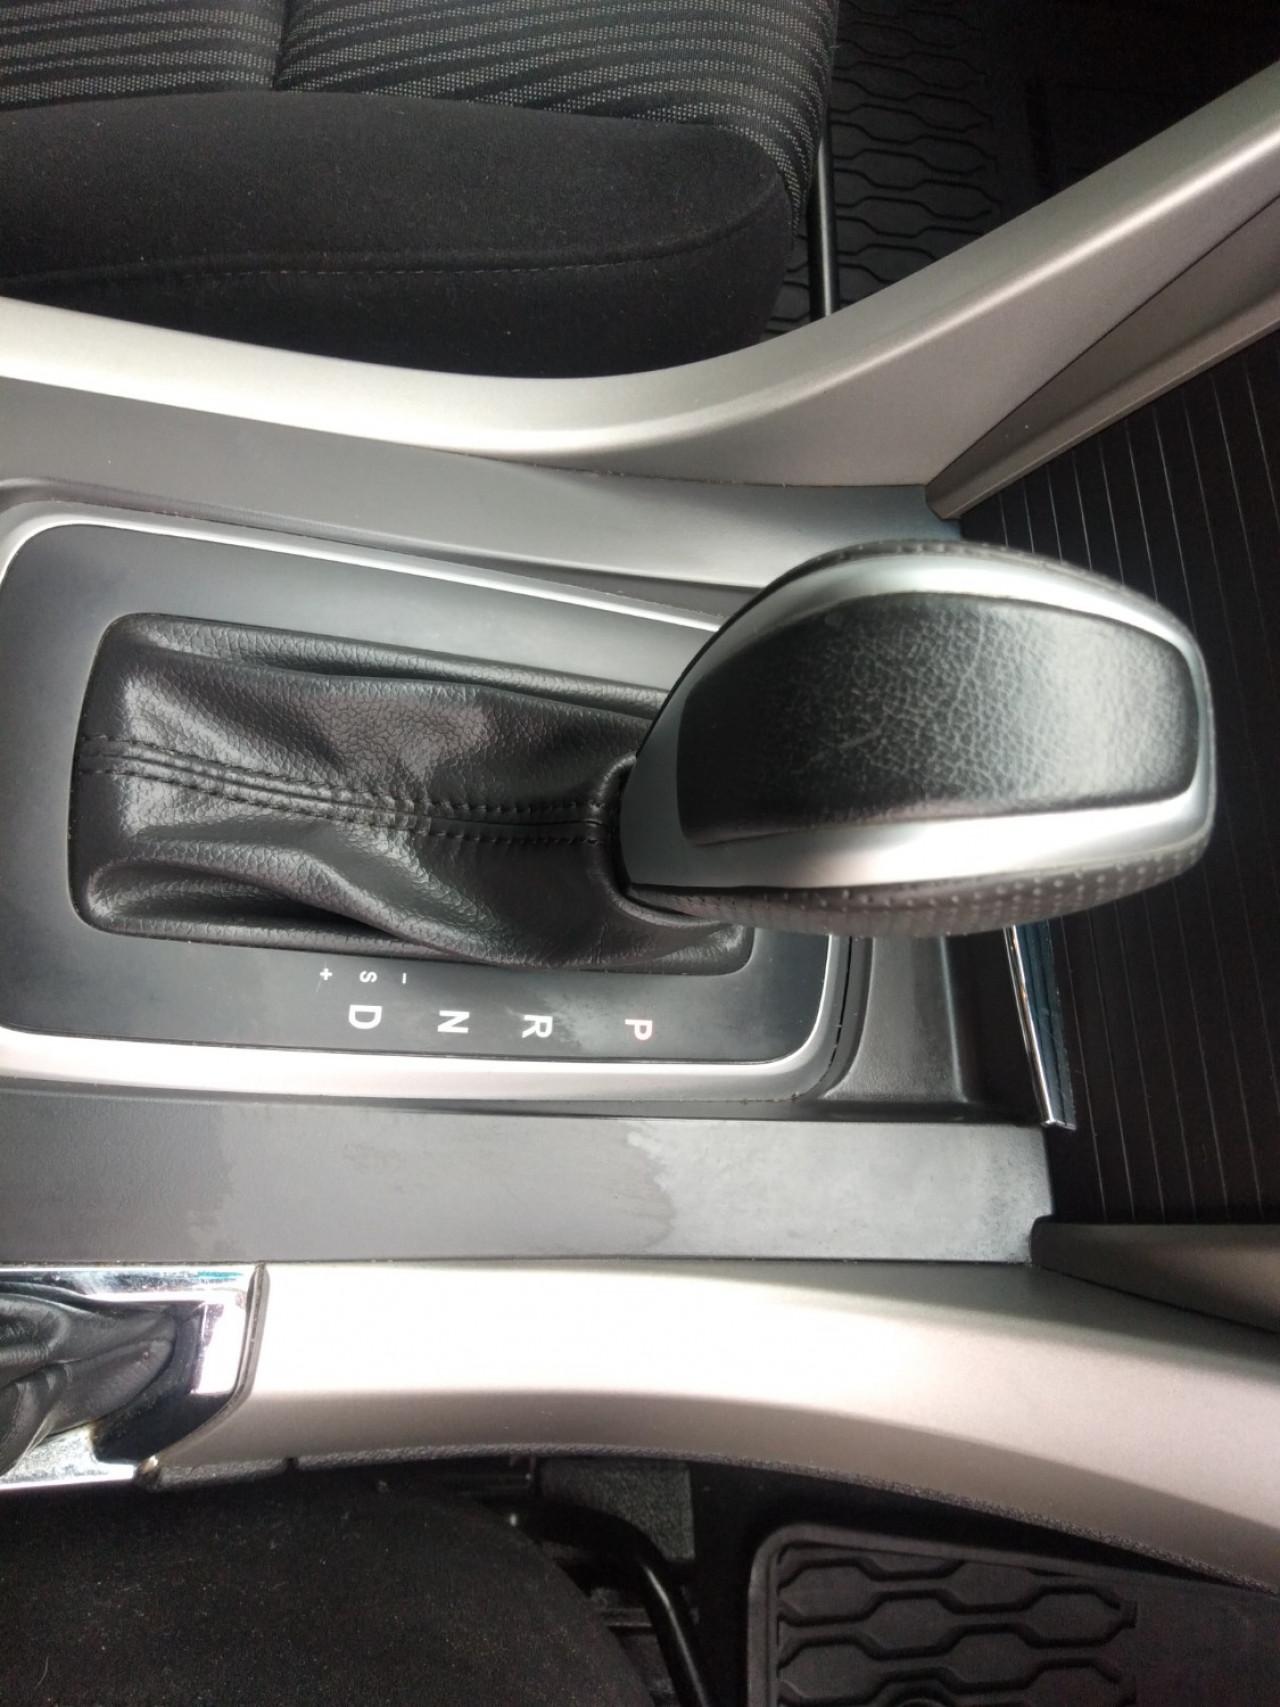 2013 Ford Territory SZ TS Wagon Image 13